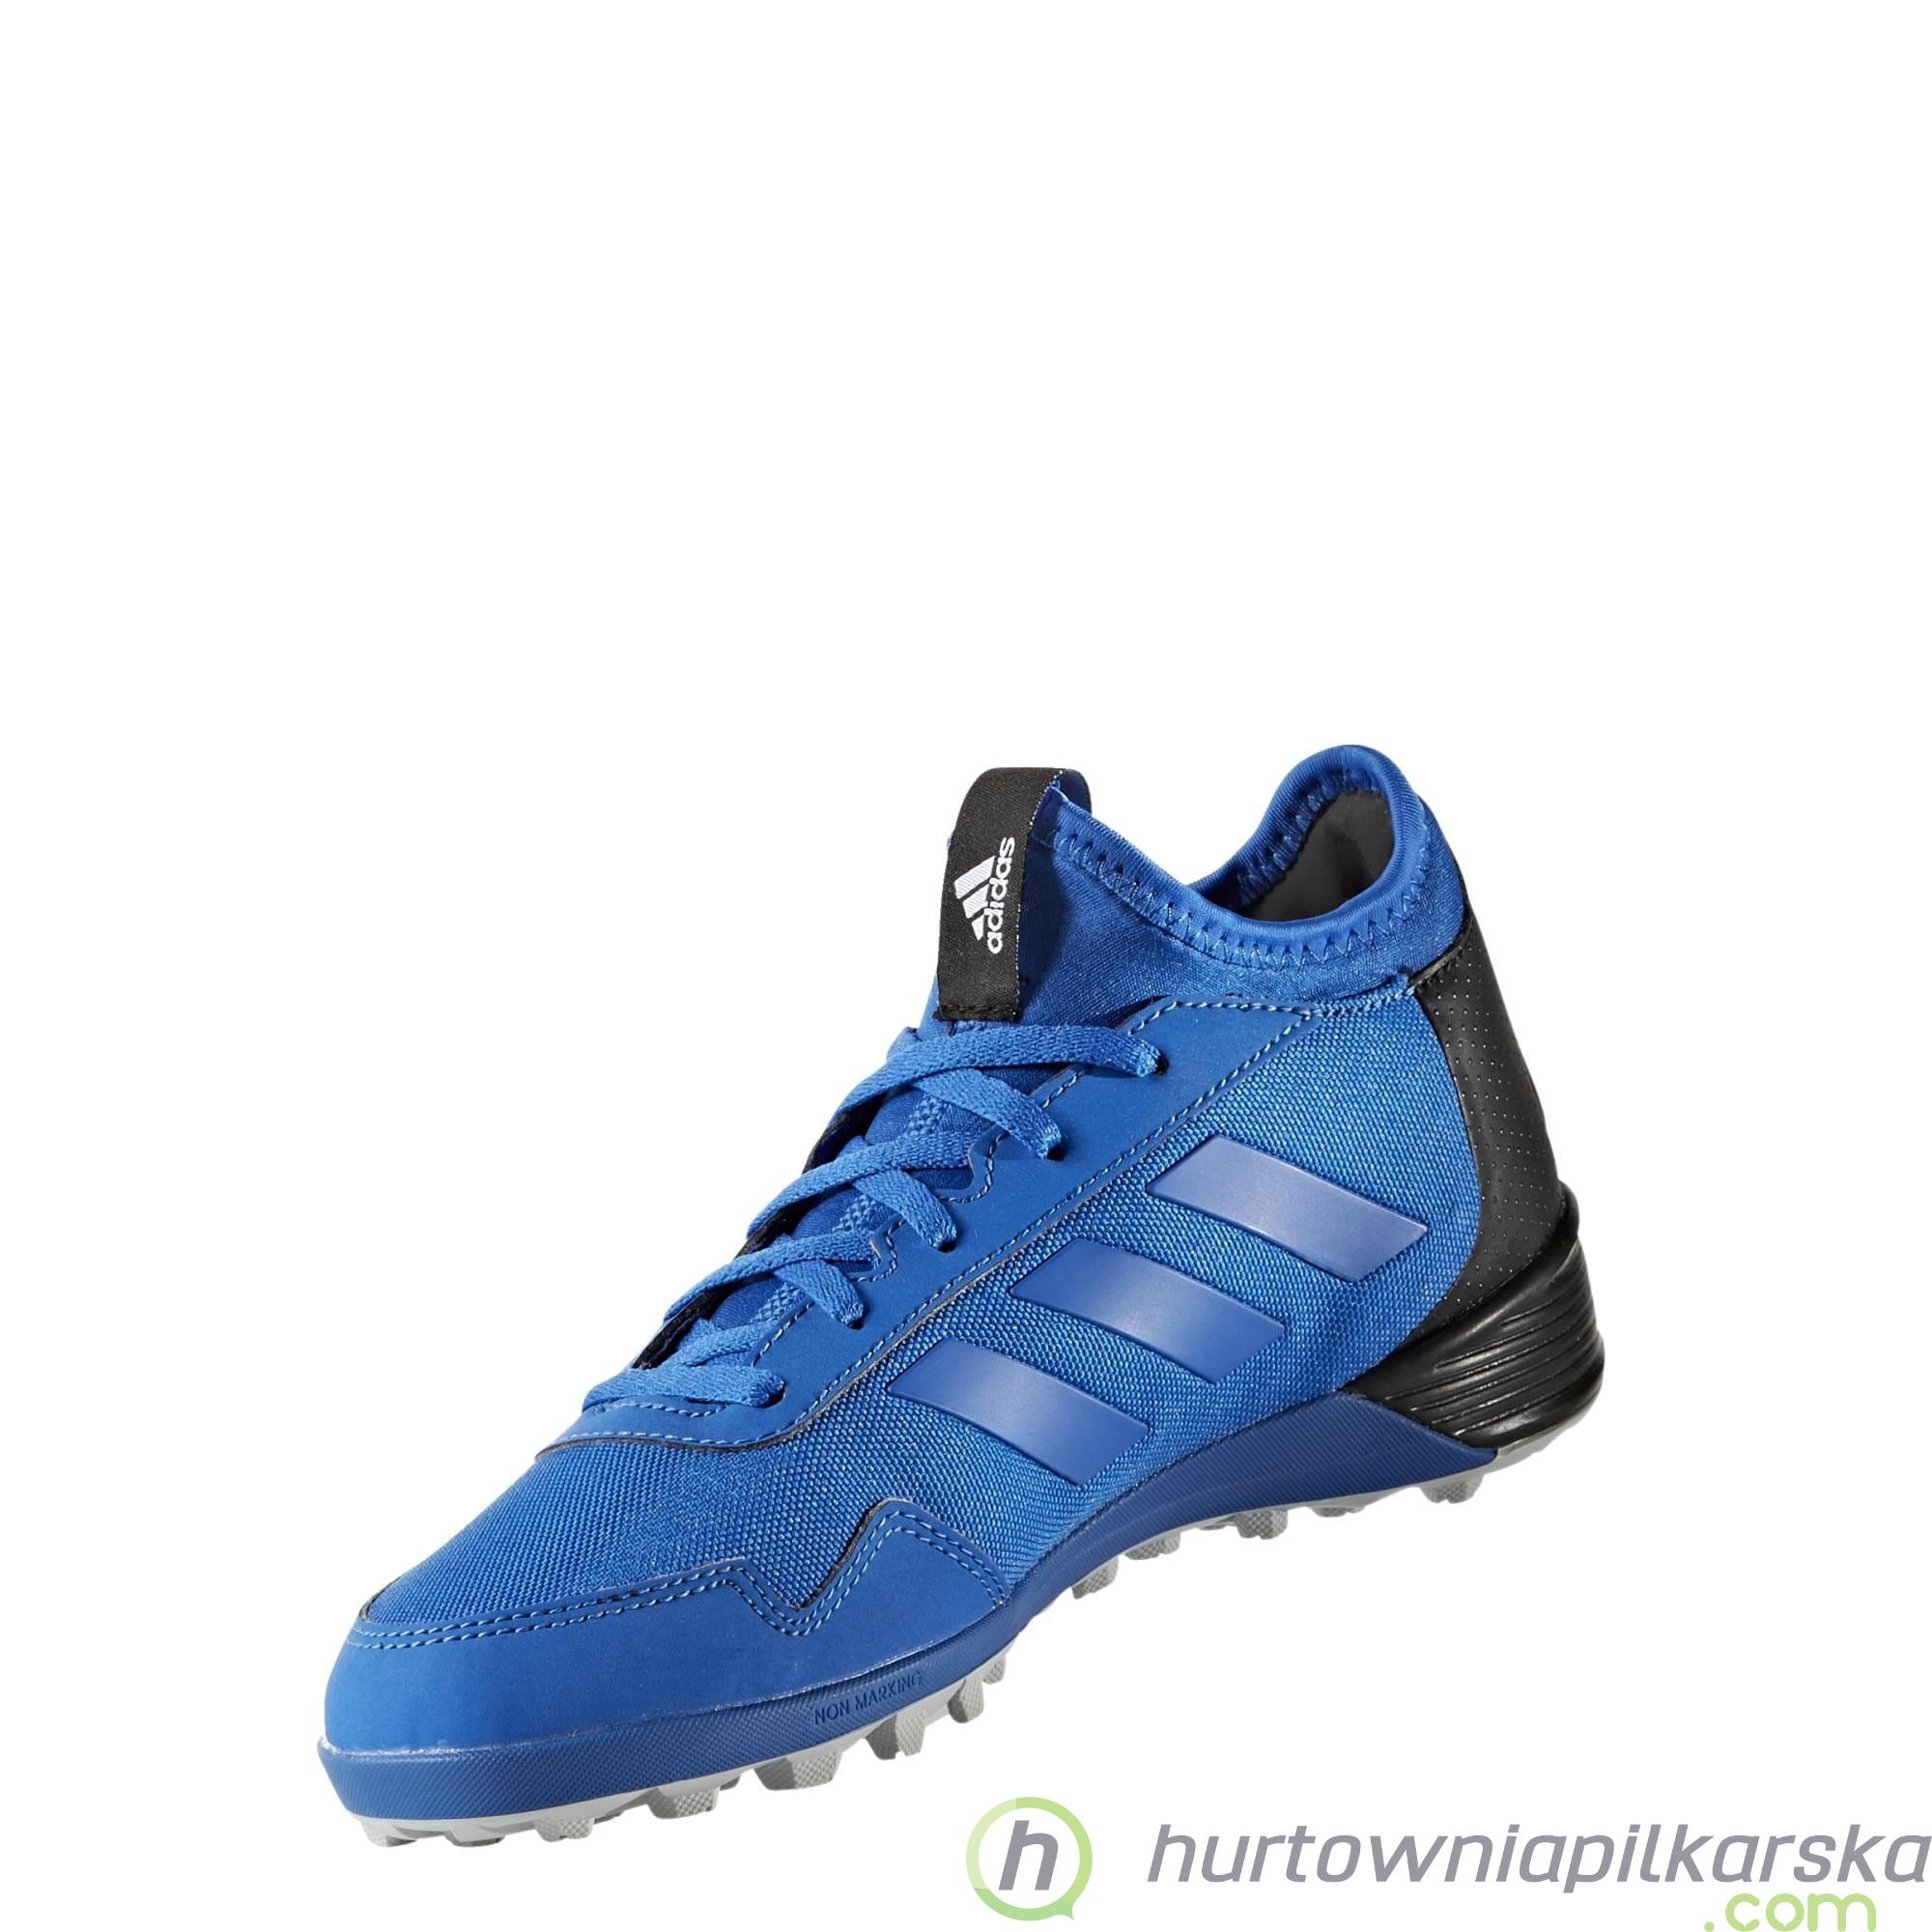 2 Buty Ace Tango Juniore Nvn08ymwo Bb5741 17 Adidas Tf uTwkZXOPi